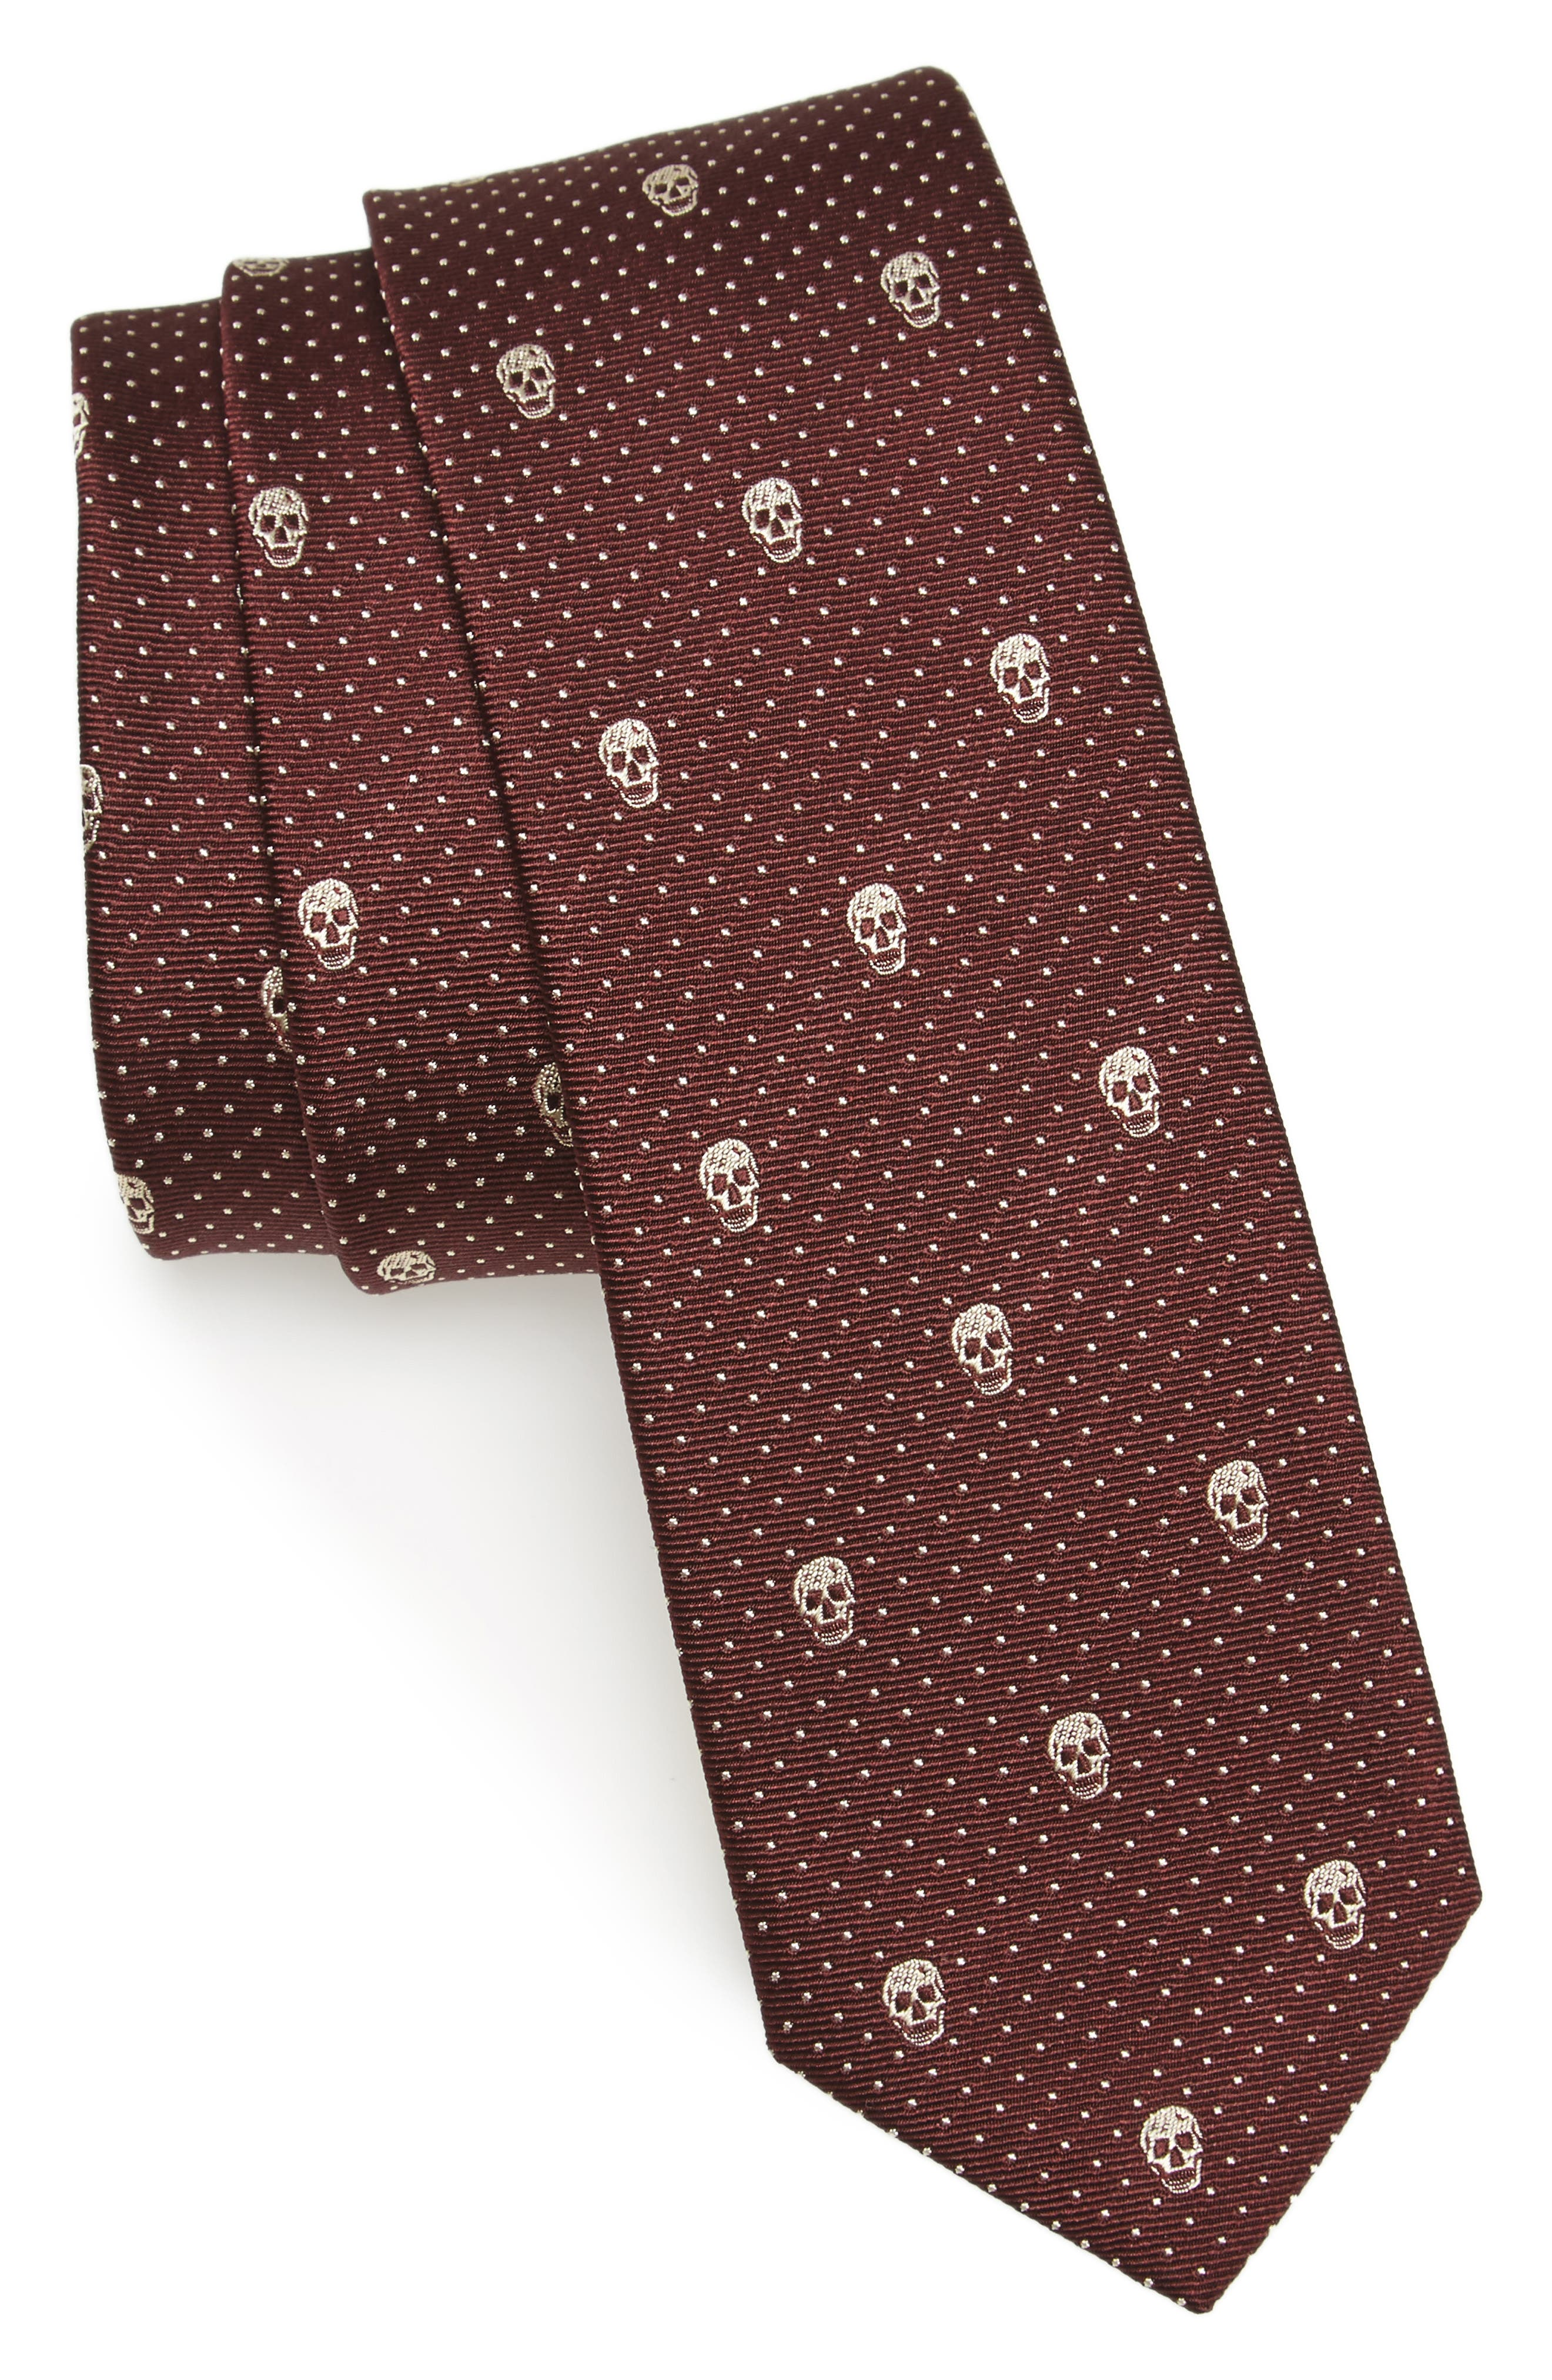 Alexander McQueen Skull Polka Dot Silk Skinny Tie